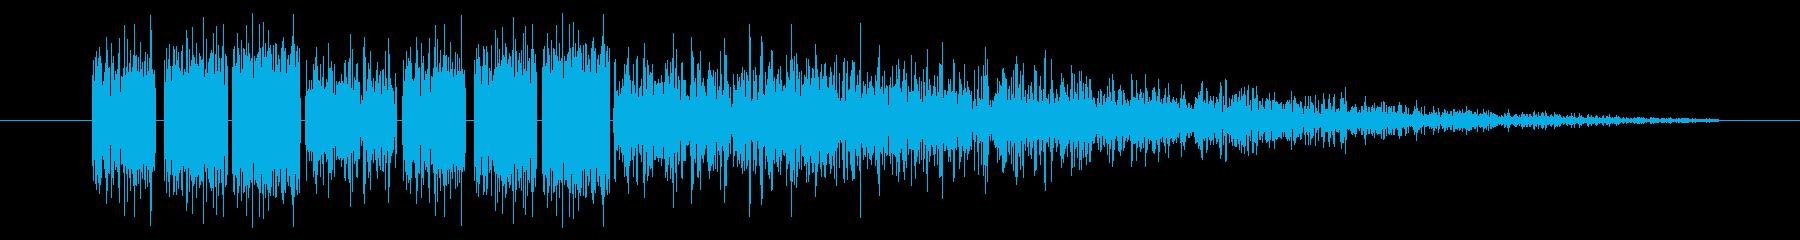 SNES-RPG04-07(魔法 雷3)の再生済みの波形